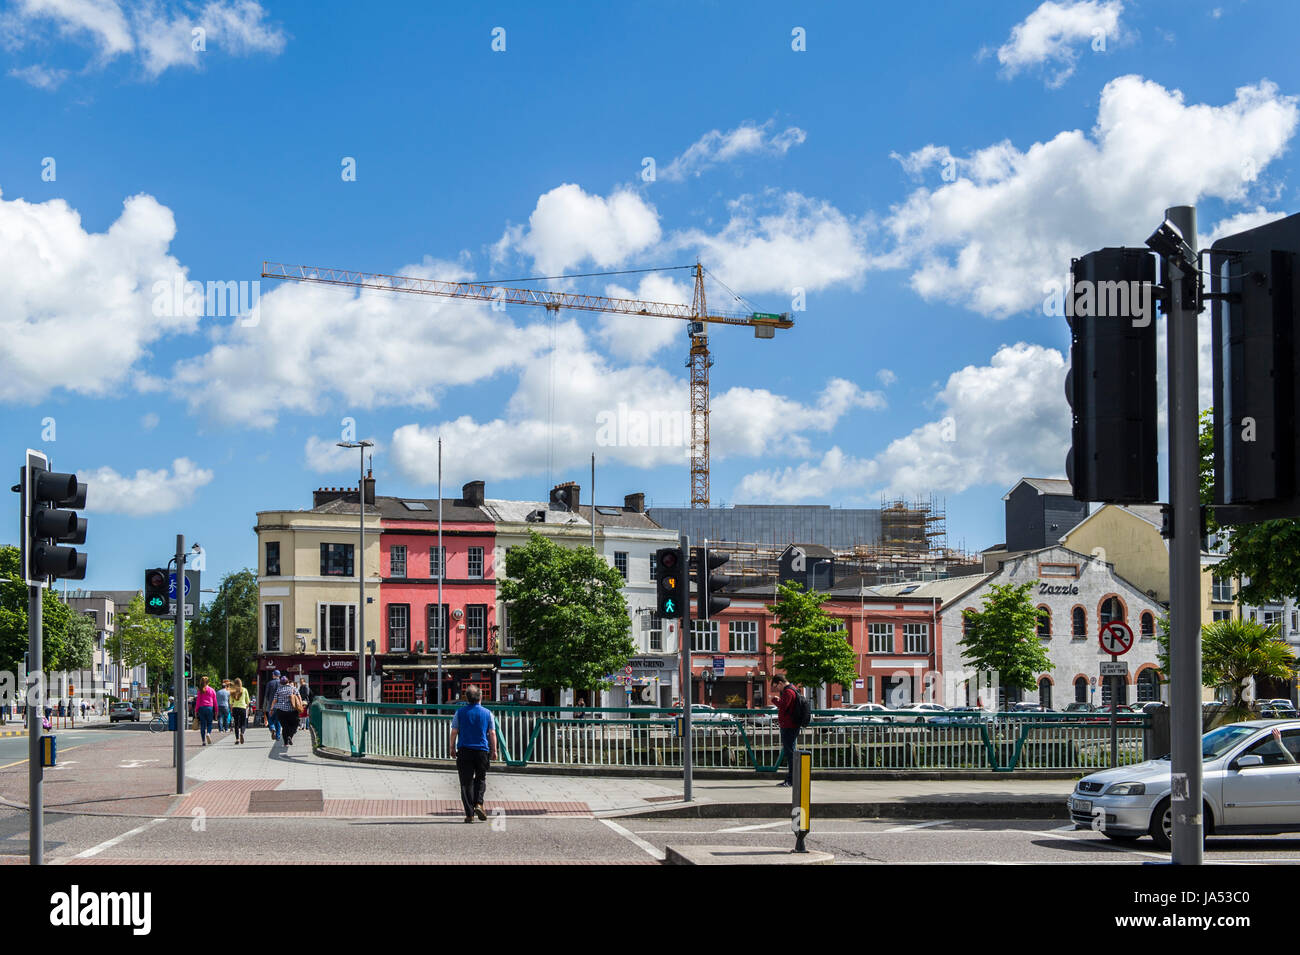 Enormous crane dominates the Cork city skyline, cork, Ireland with copy space . - Stock Image